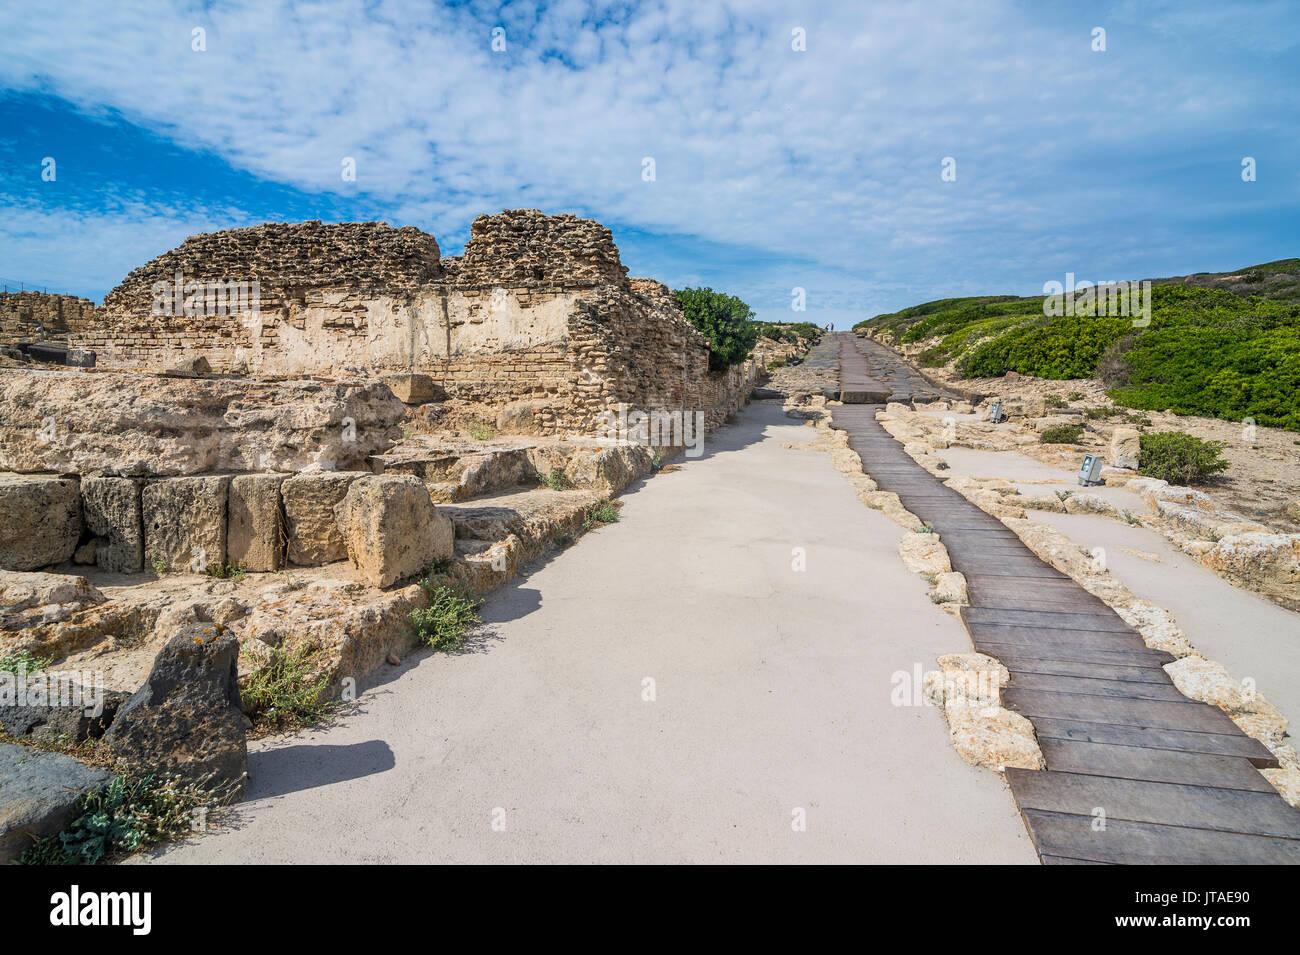 Sitio arqueológico de Tharros, Cerdeña, Italia, Mediterráneo, Europa Imagen De Stock